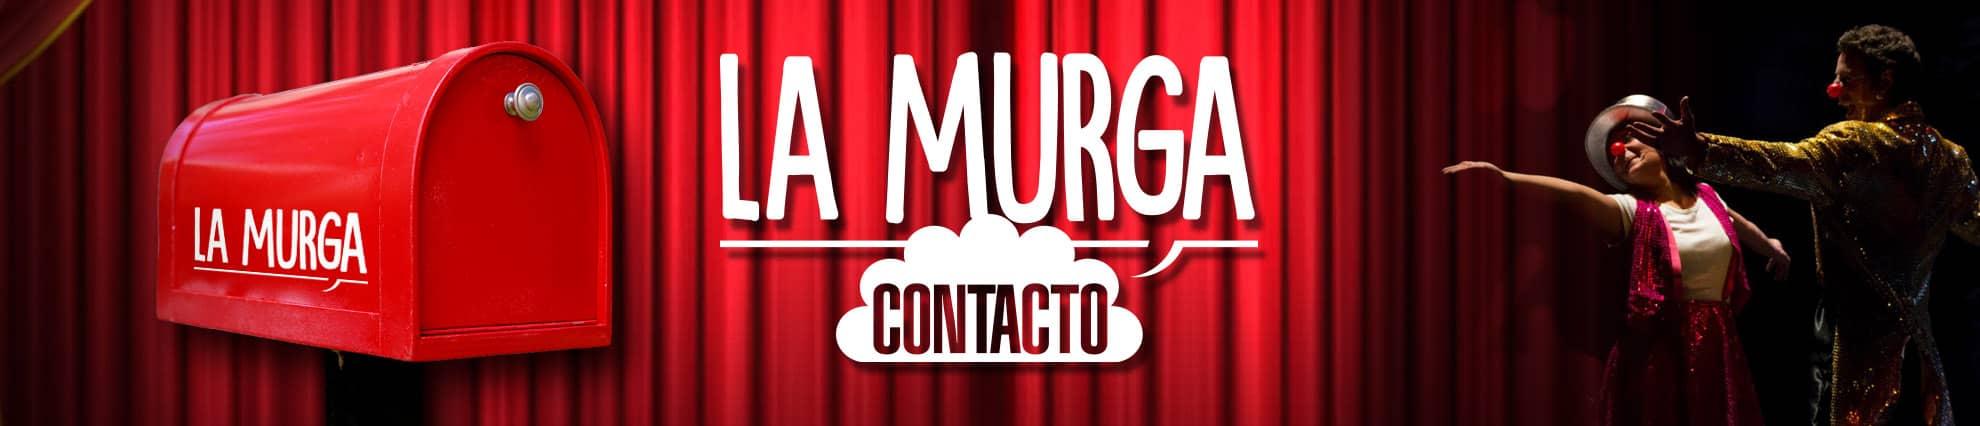 Contacto La Murga Teatro